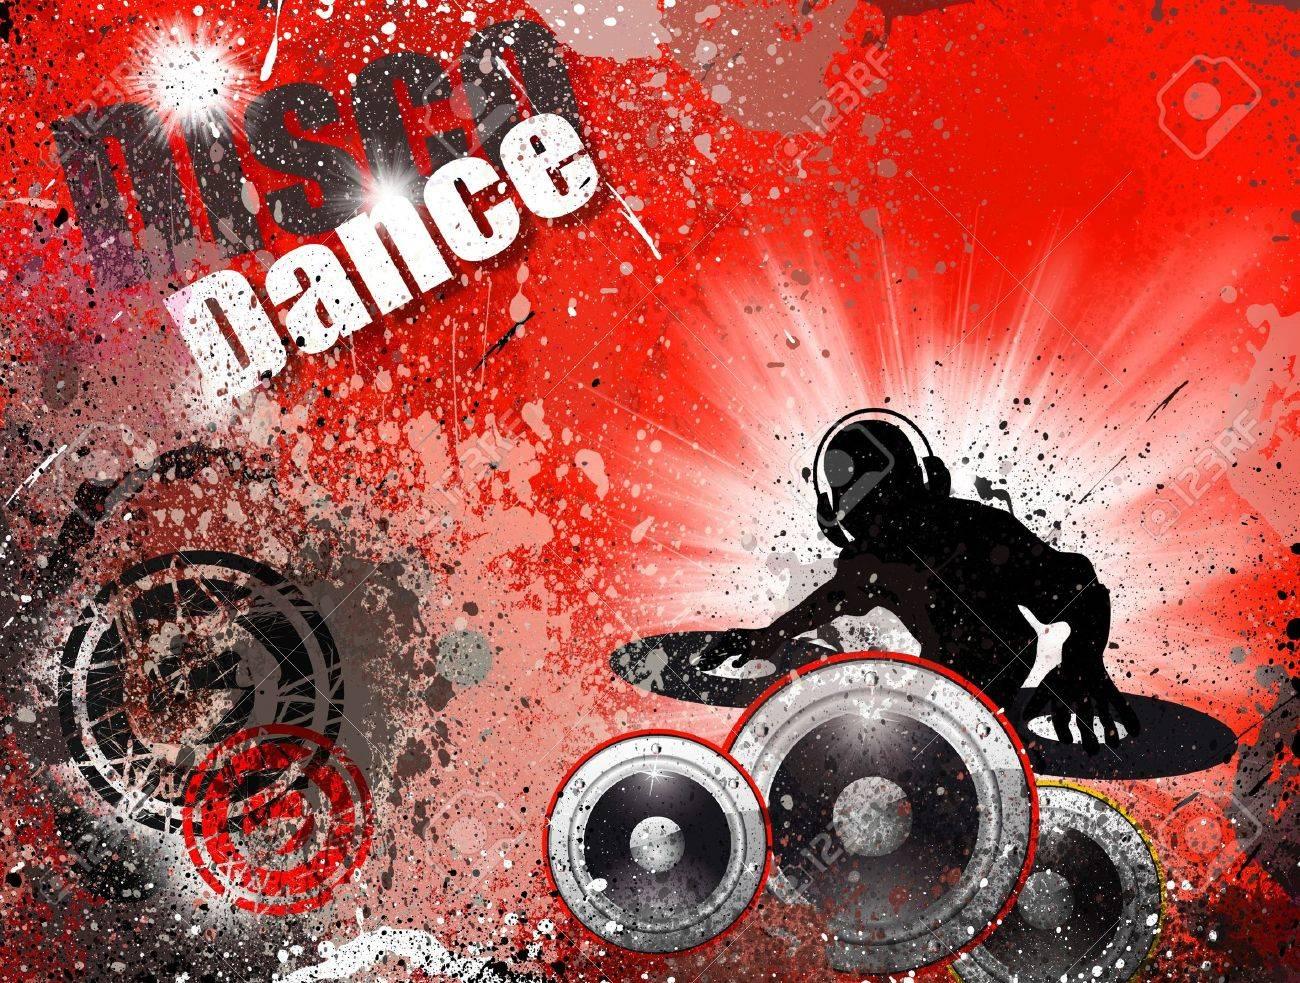 Techno Grunge style DJ Disco Flyer Background Stock Photo - 7825385